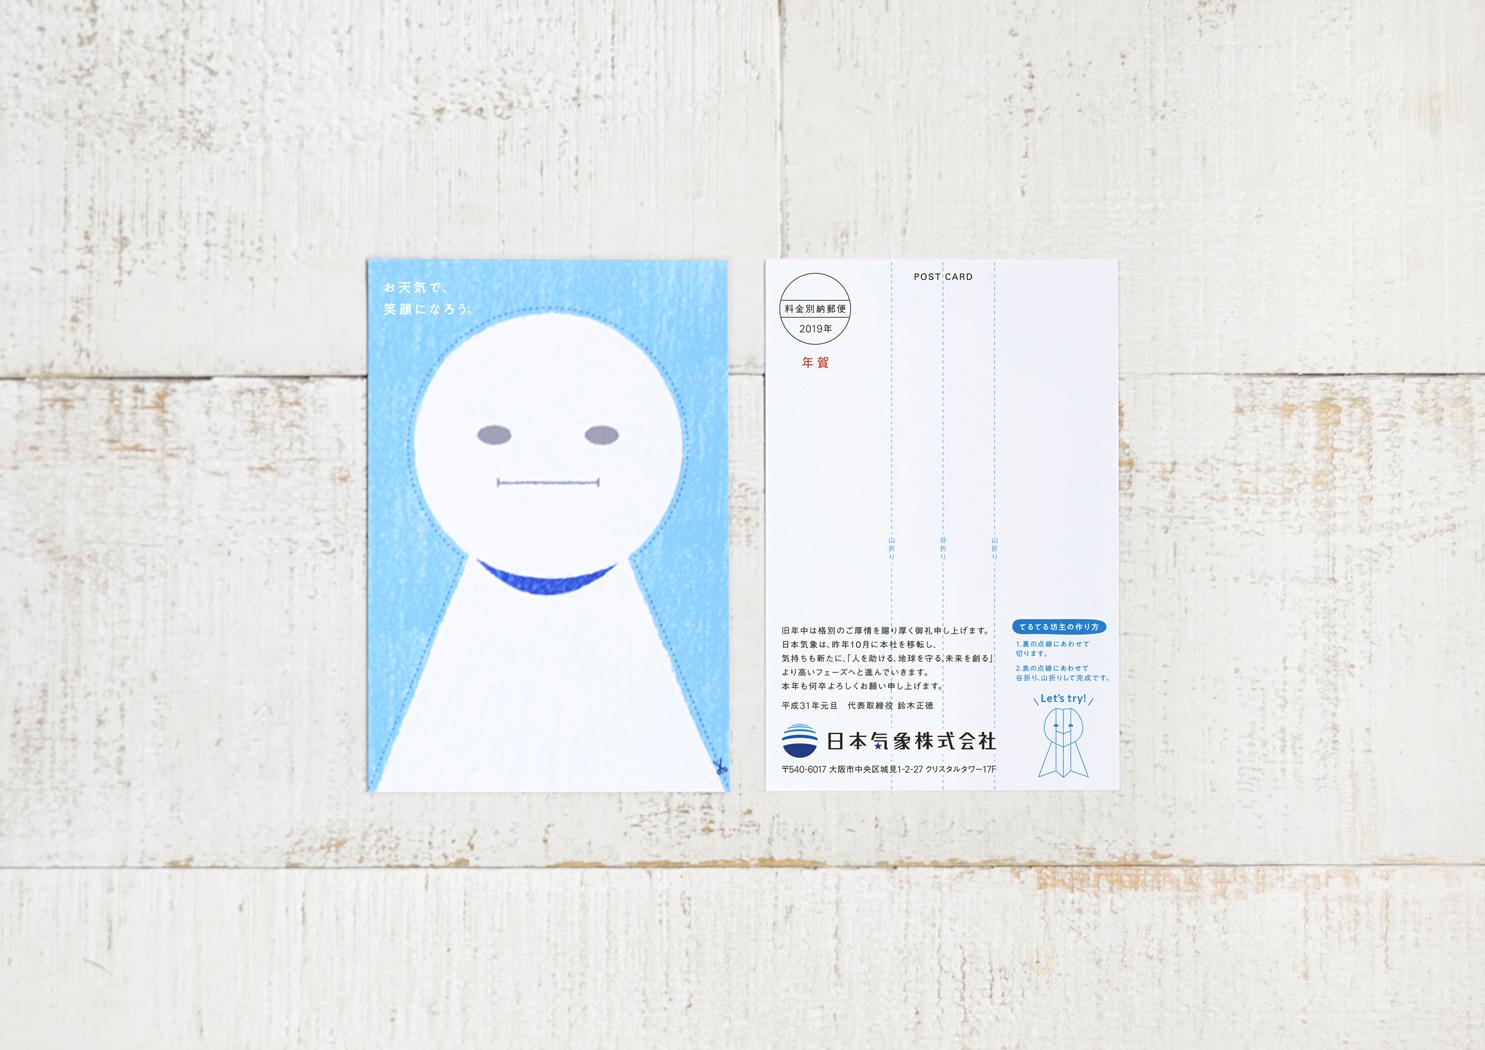 Nihonkisyo New Year's Card 2019